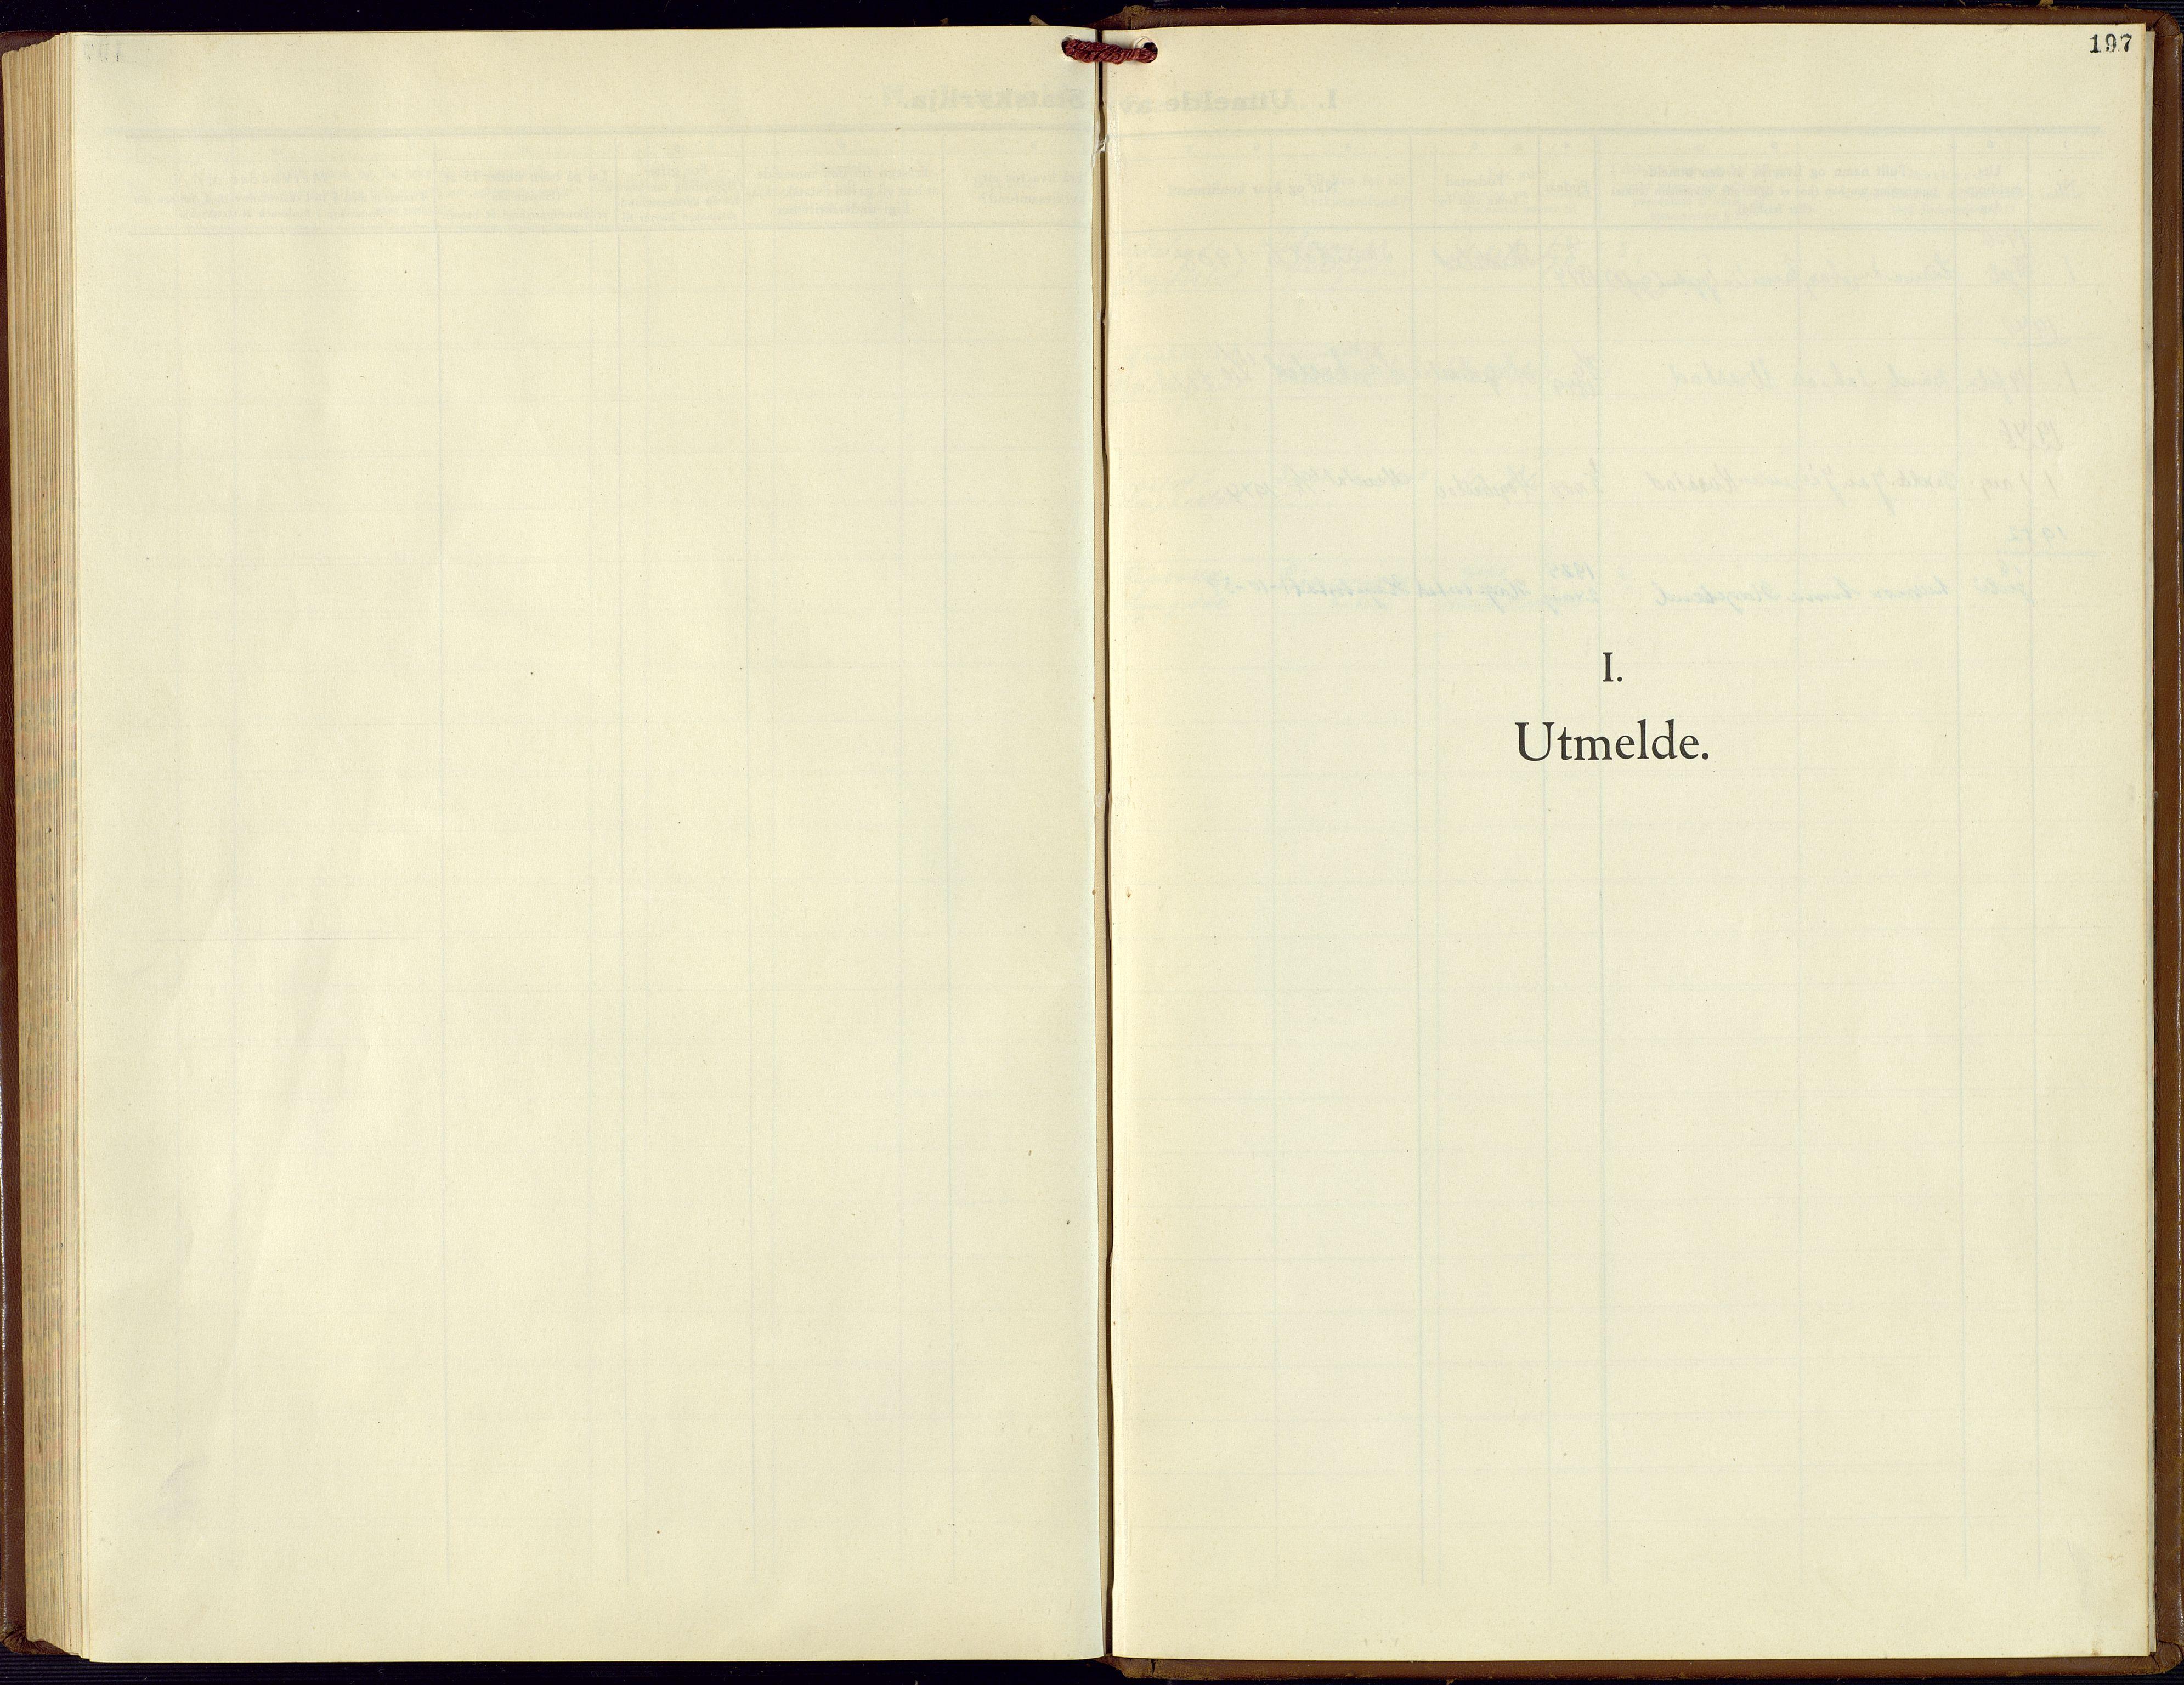 SAK, Hægebostad sokneprestkontor, F/Fb/Fba/L0006: Klokkerbok nr. B 6, 1931-1970, s. 197